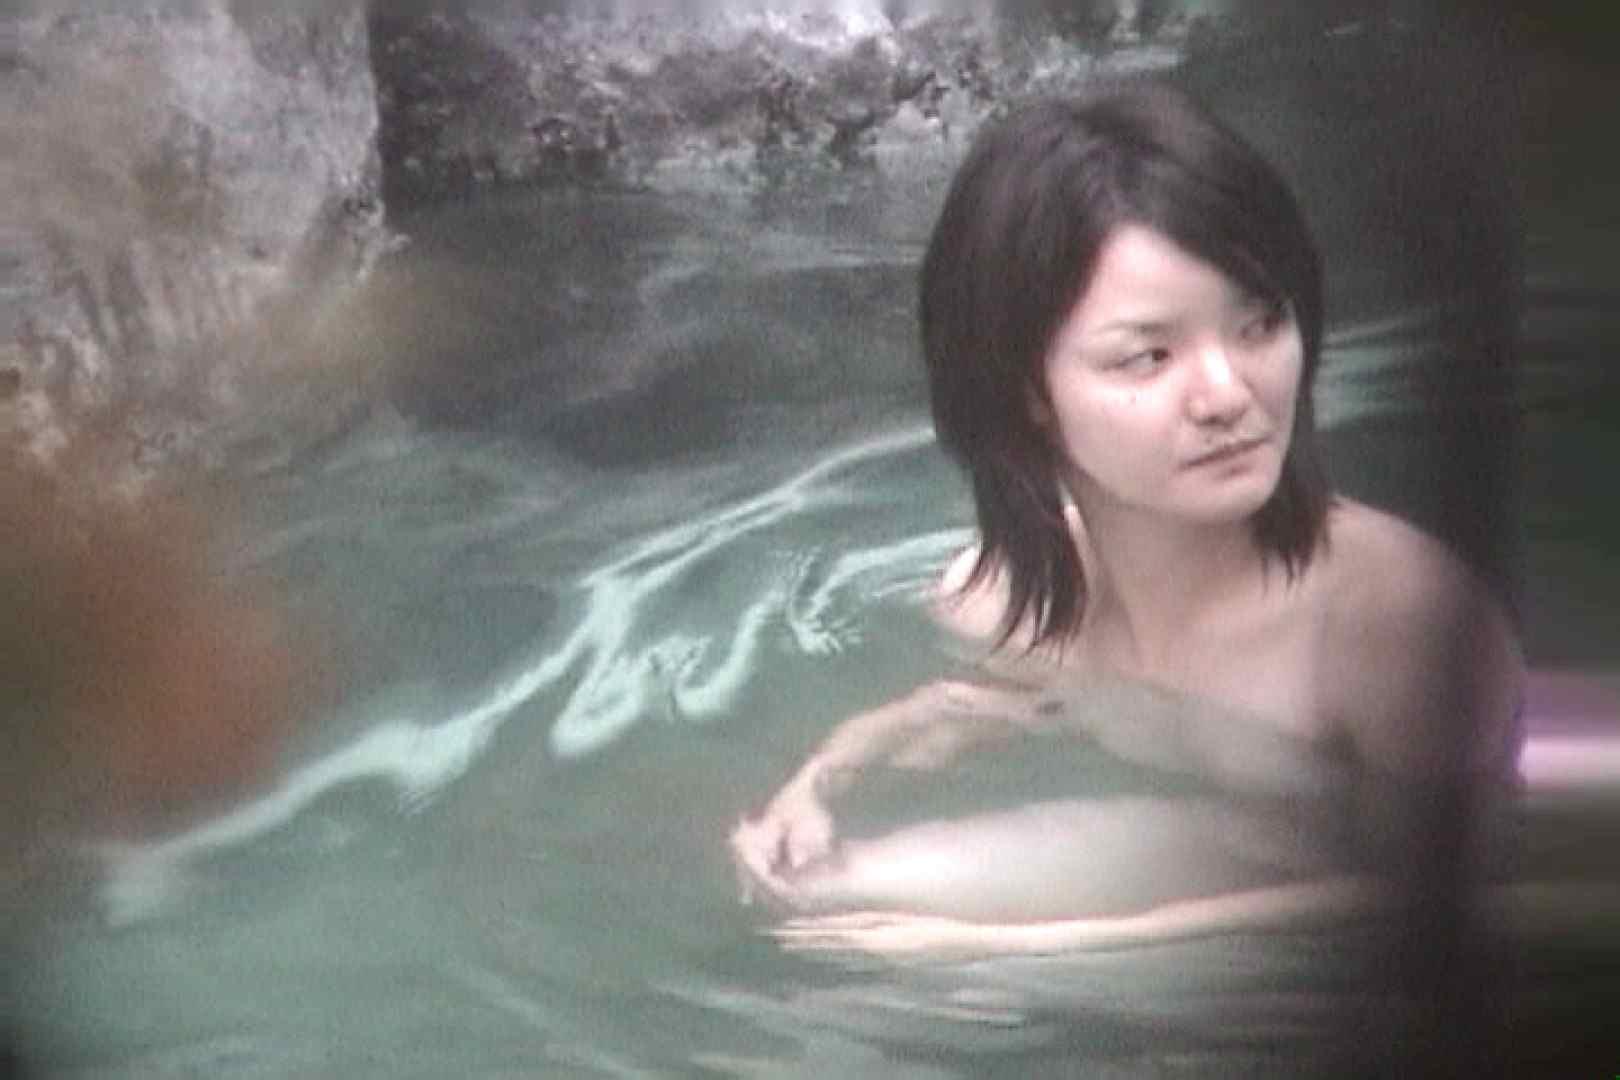 Aquaな露天風呂Vol.71【VIP限定】 盗撮 のぞき動画画像 107画像 68